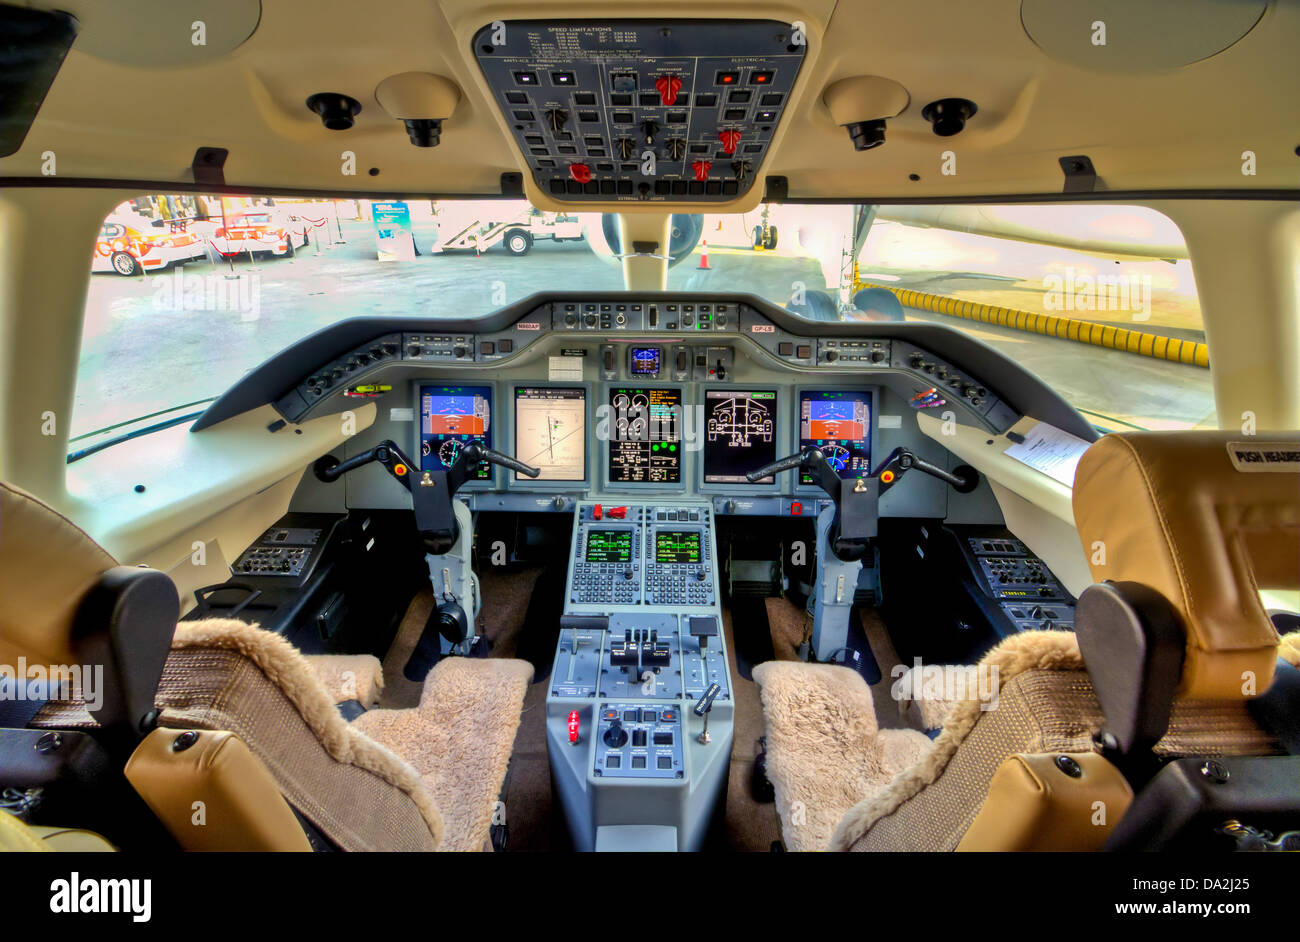 Cockpit View - Stock Image